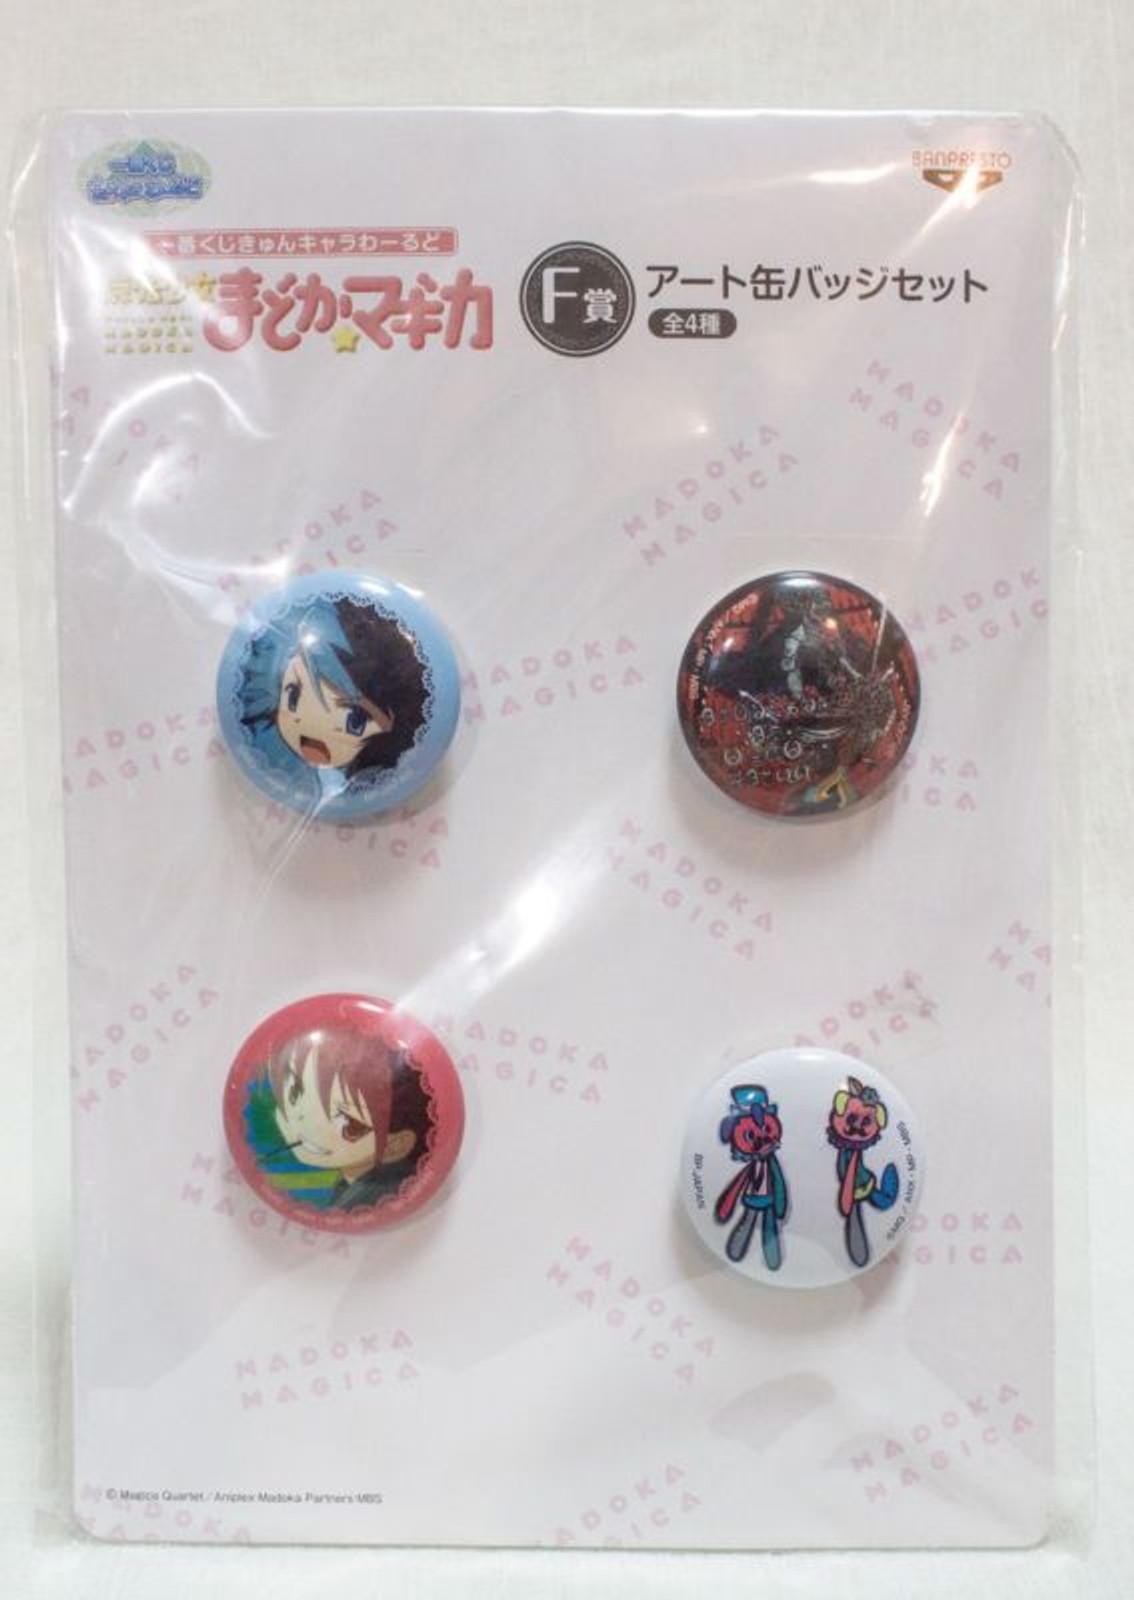 Puella Magi Madoka Magica Button badge set Ichiban Kuji Banpresto JAPAN ANIME MANGA